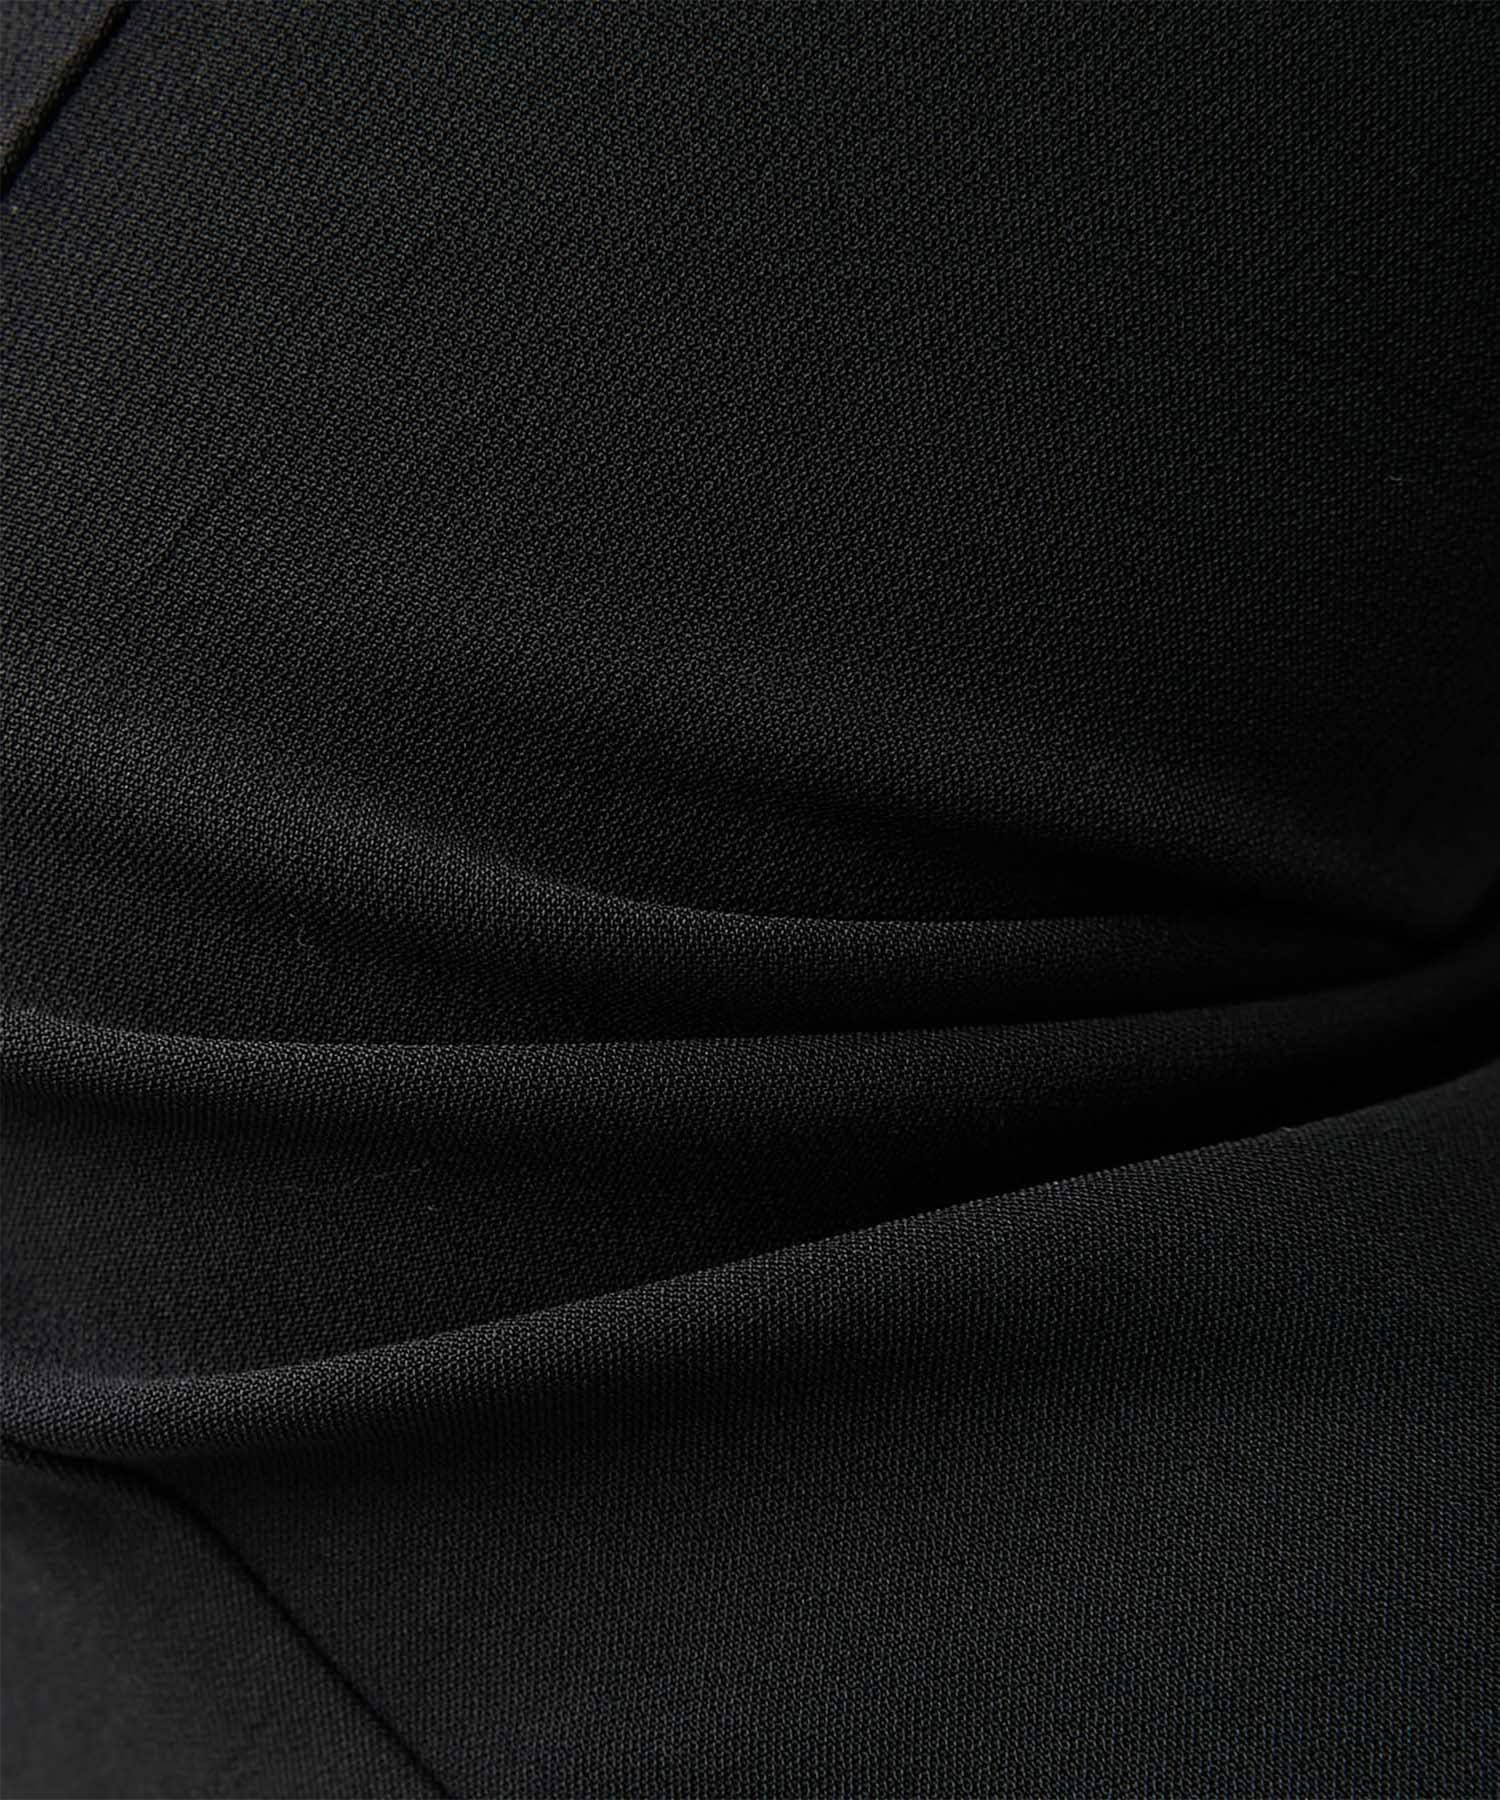 GALLARDAGALANTE(ガリャルダガランテ) 【CEPIE.】ダブルクロスヘムベンツスリムパンツ